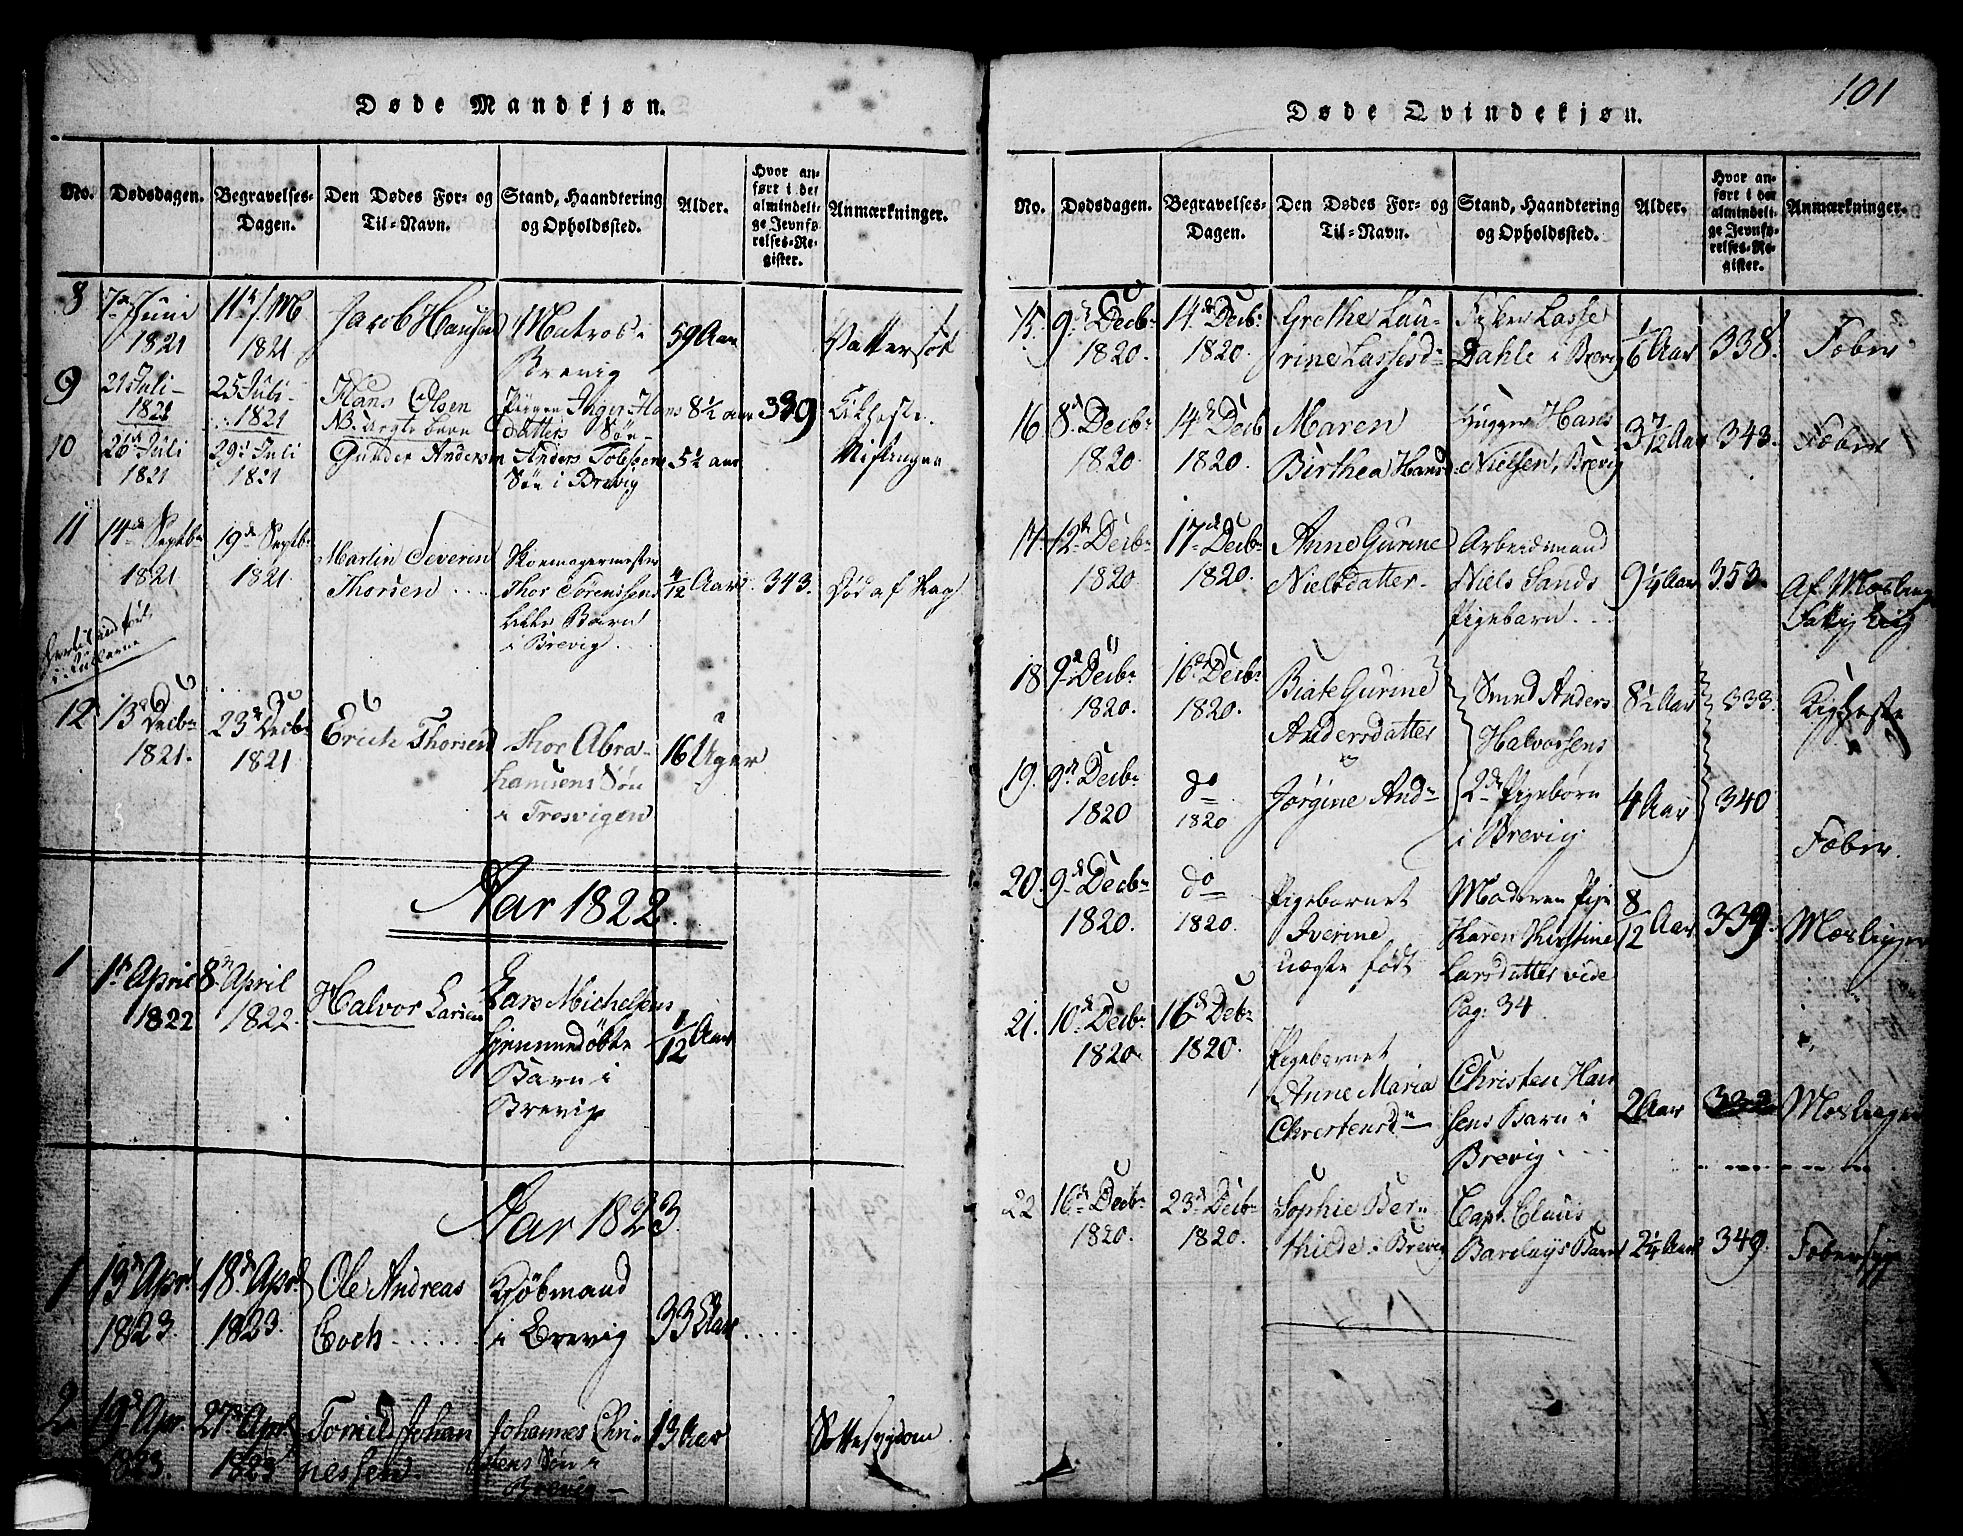 SAKO, Brevik kirkebøker, G/Ga/L0001: Klokkerbok nr. 1, 1814-1845, s. 101